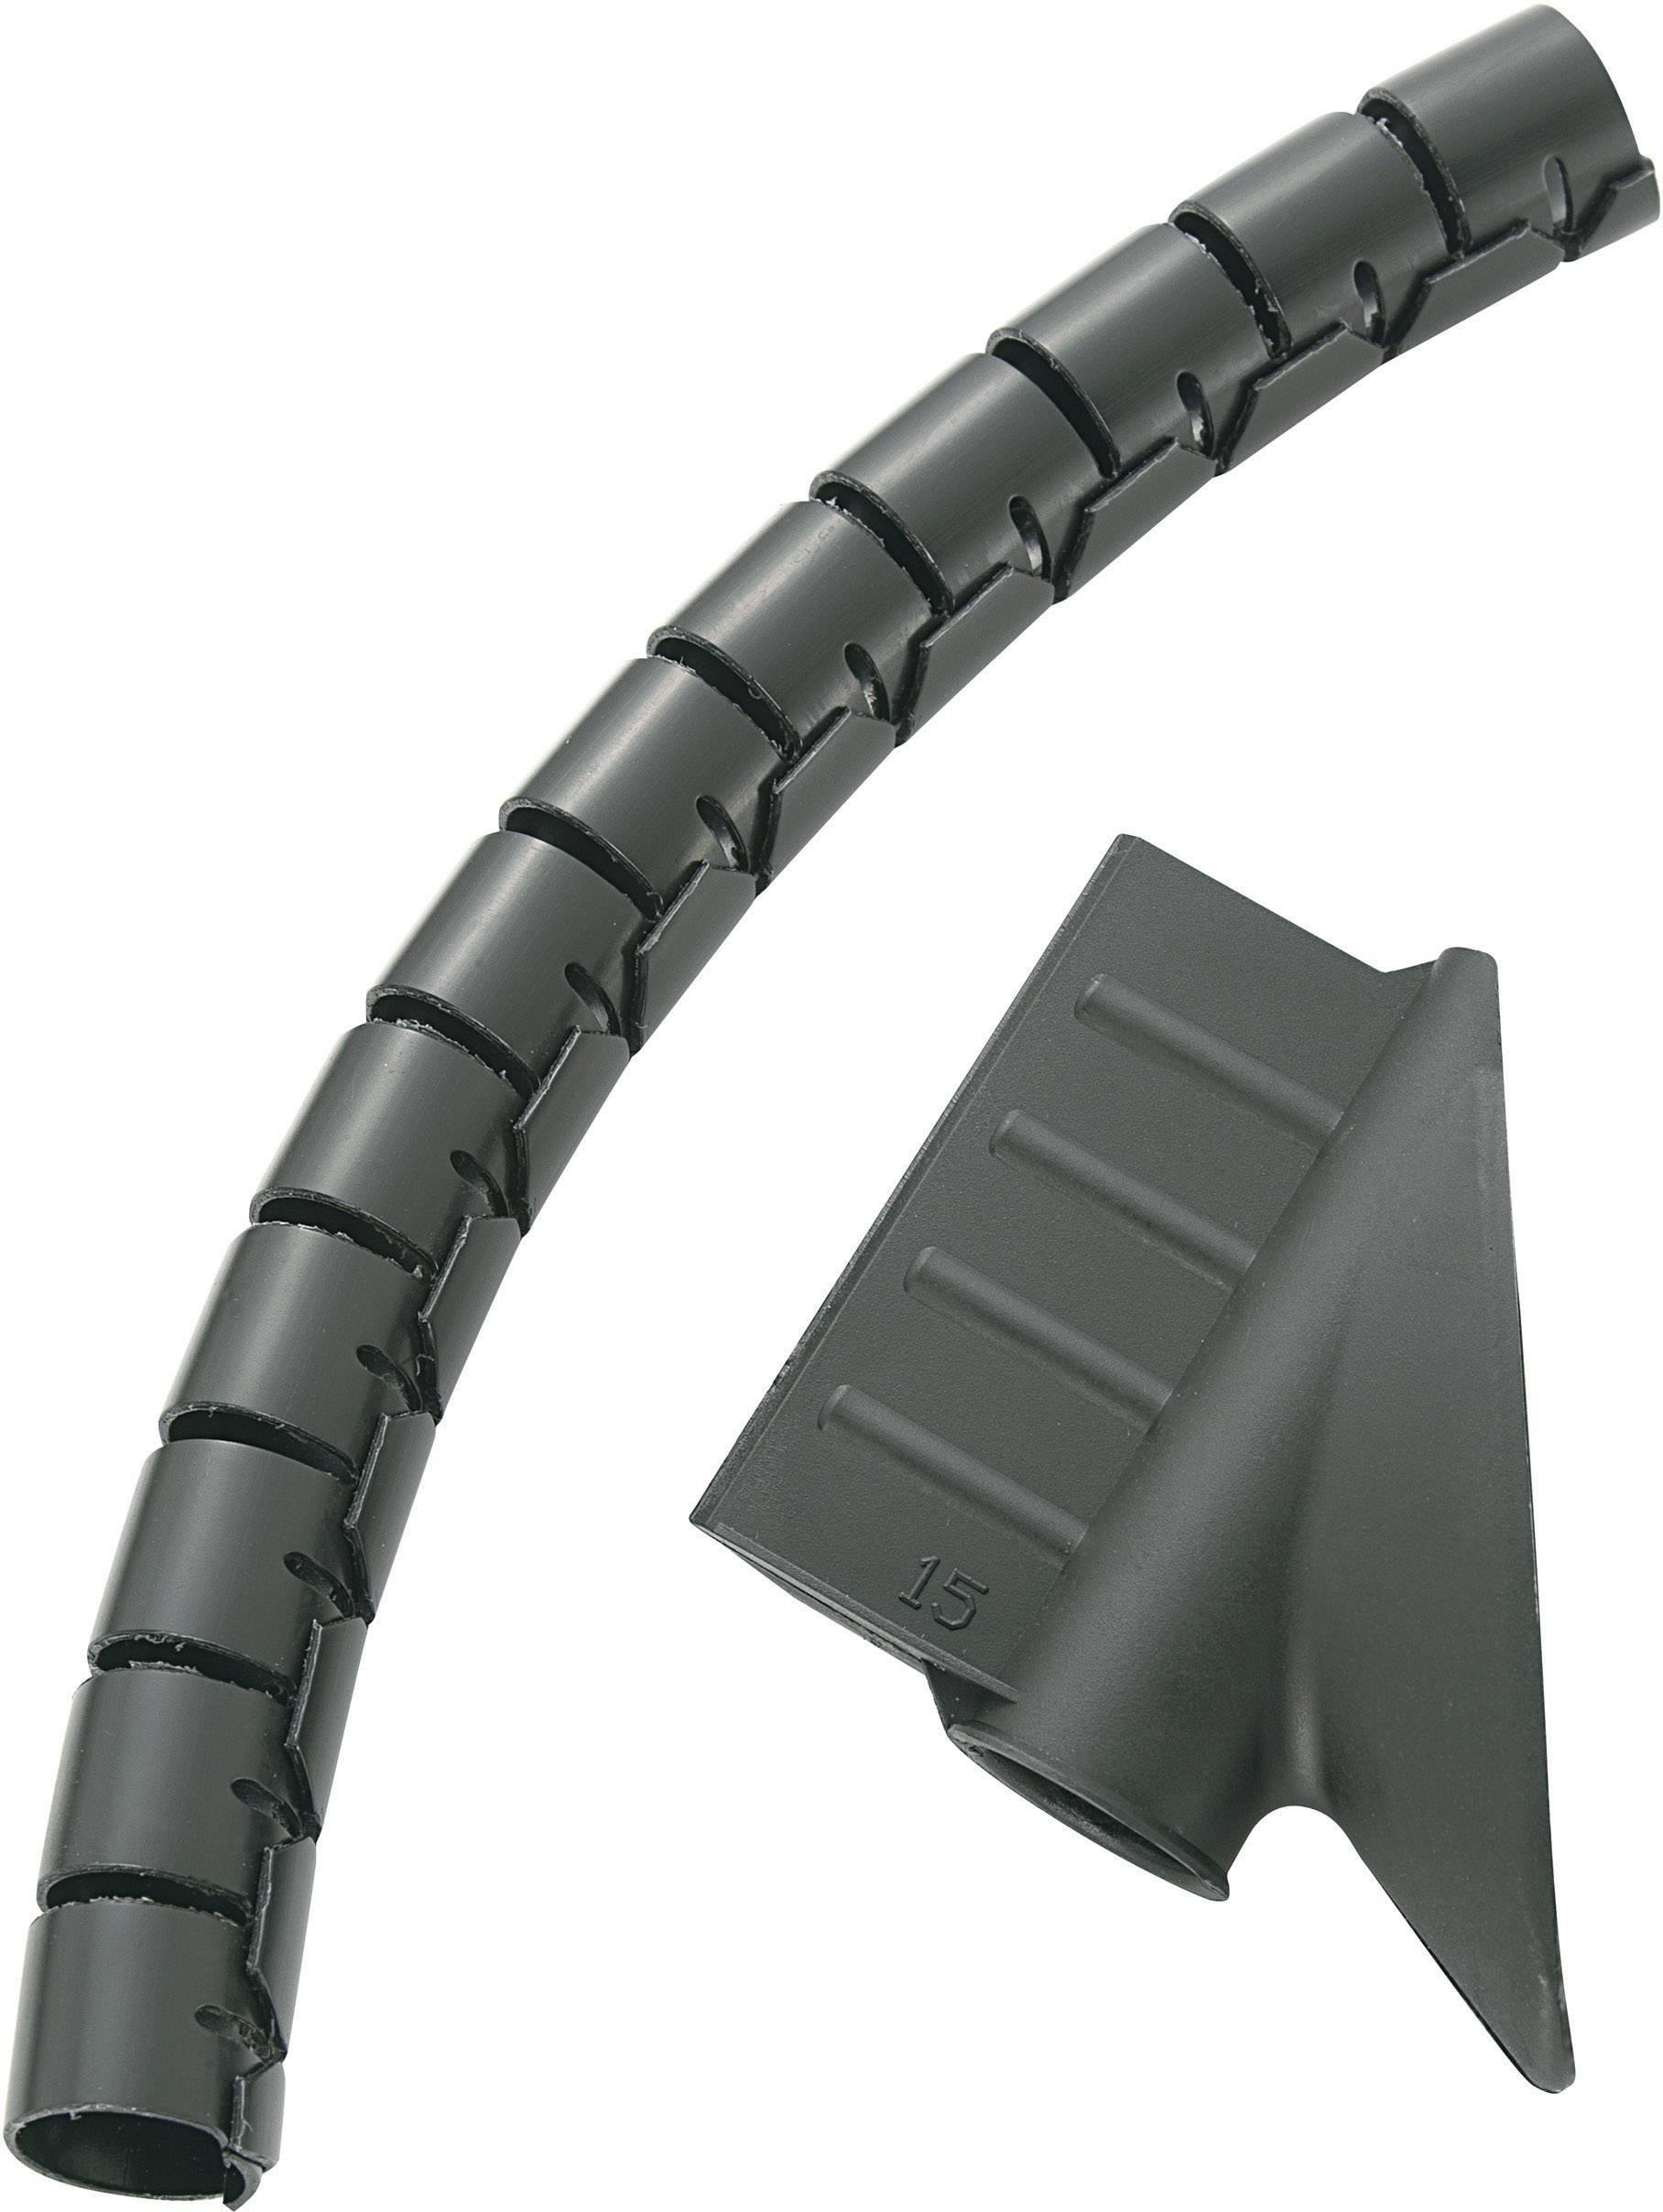 Spirálová trubice na kabely KSS MX-KLT15WE (28530c1027), 15 mm, bílá